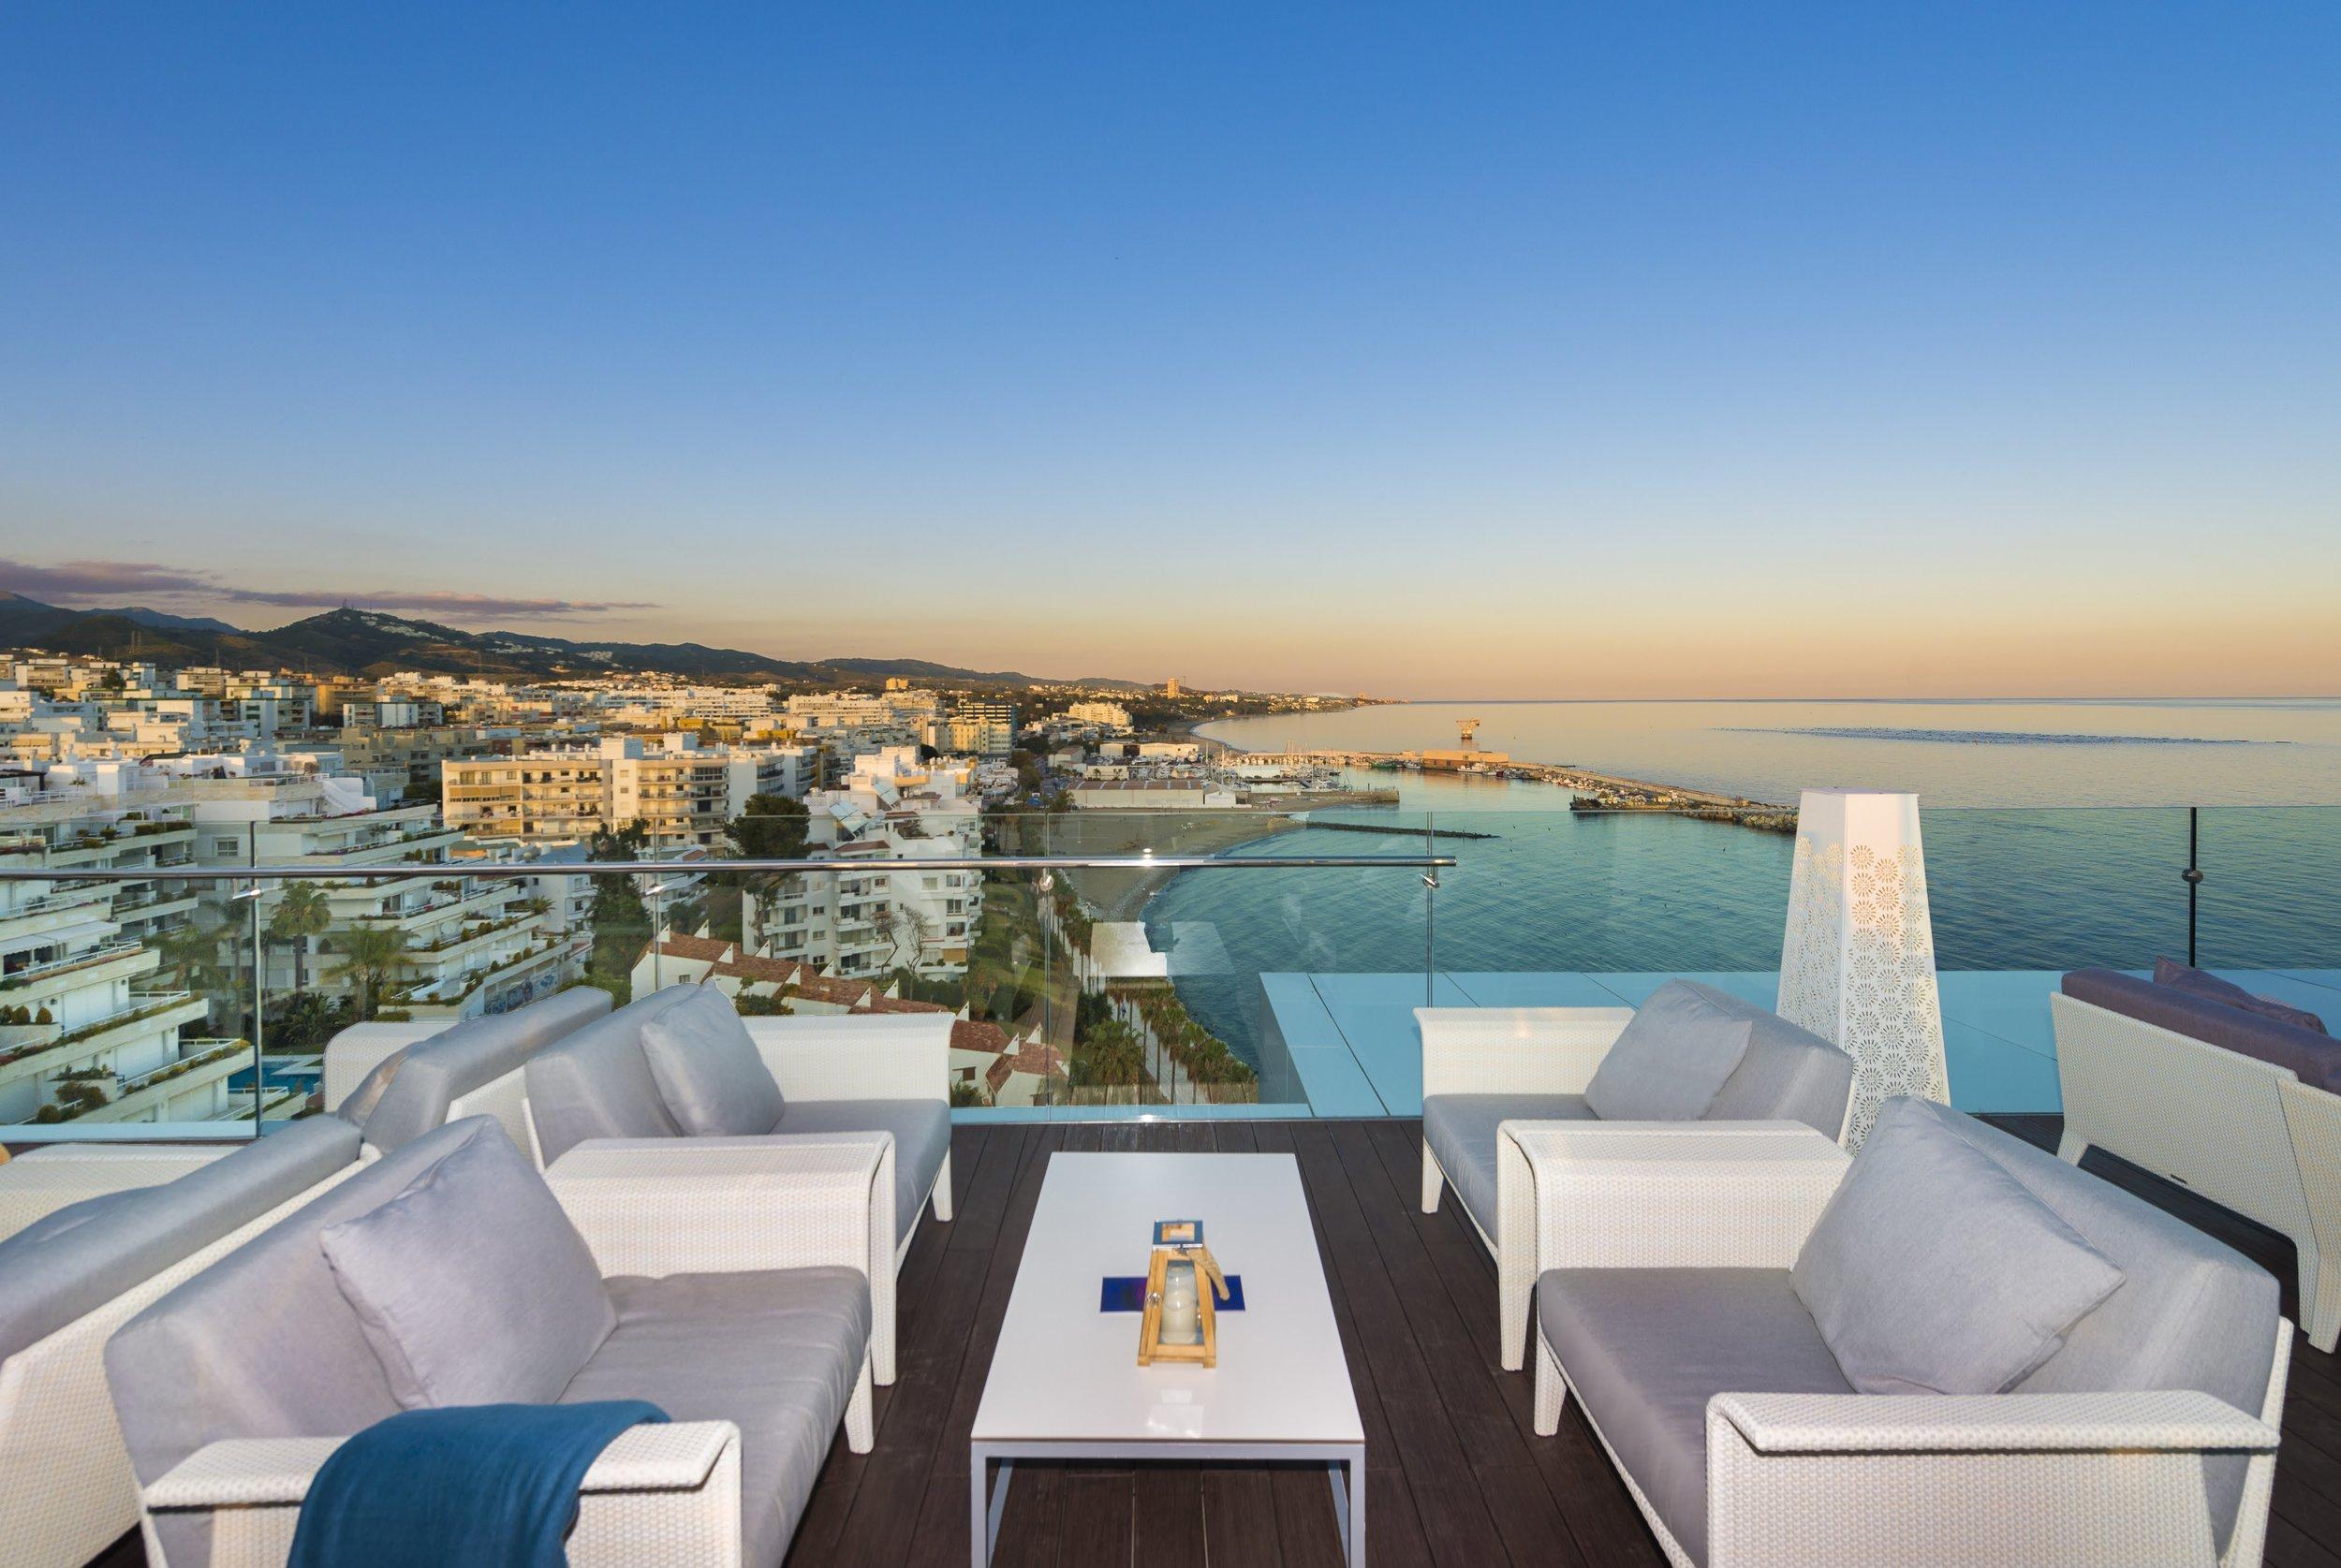 Amare Beach Hotel Marbella rooftop bar